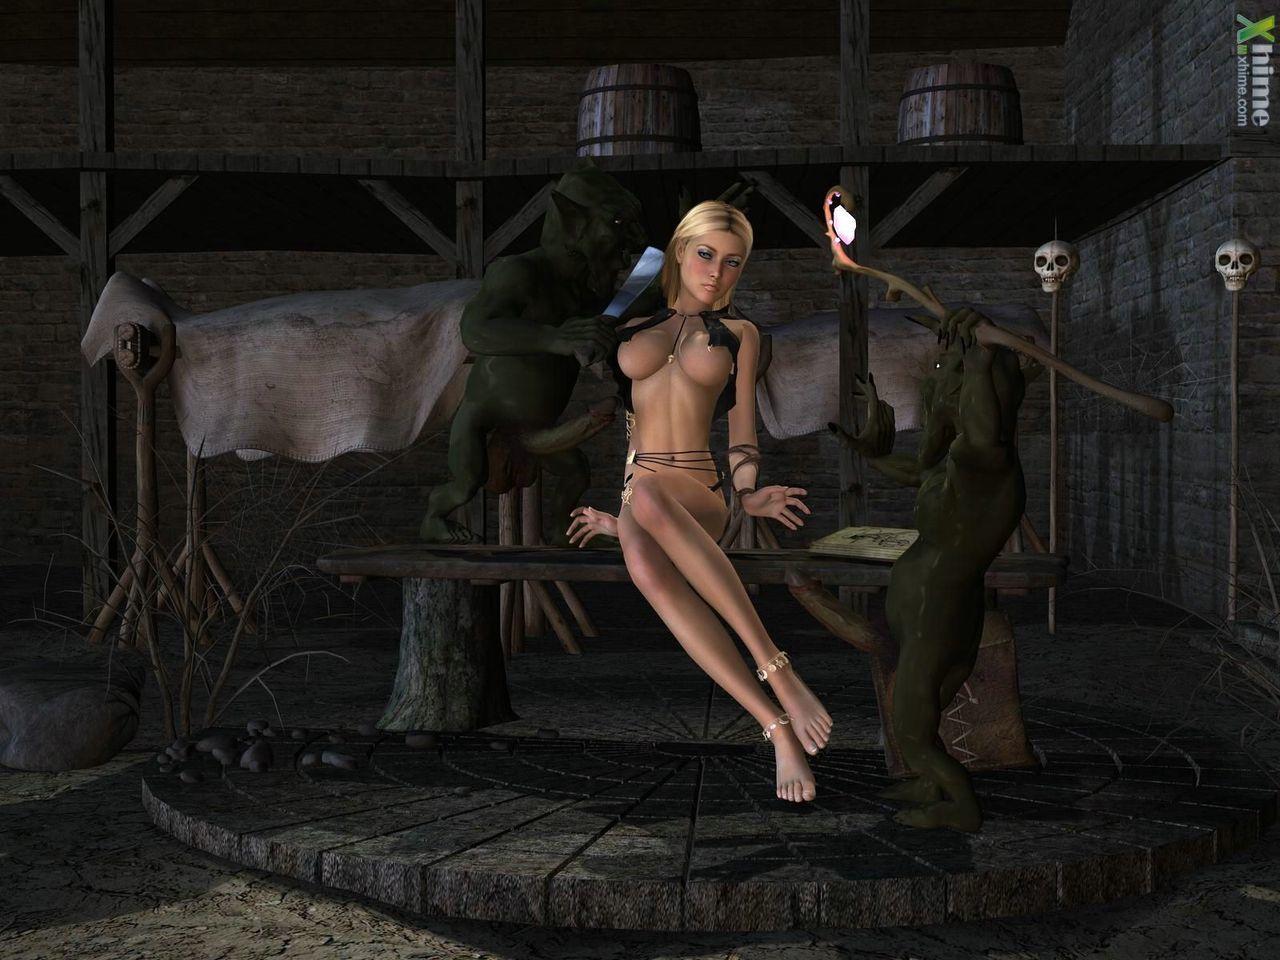 fantasy cg collection - part 2